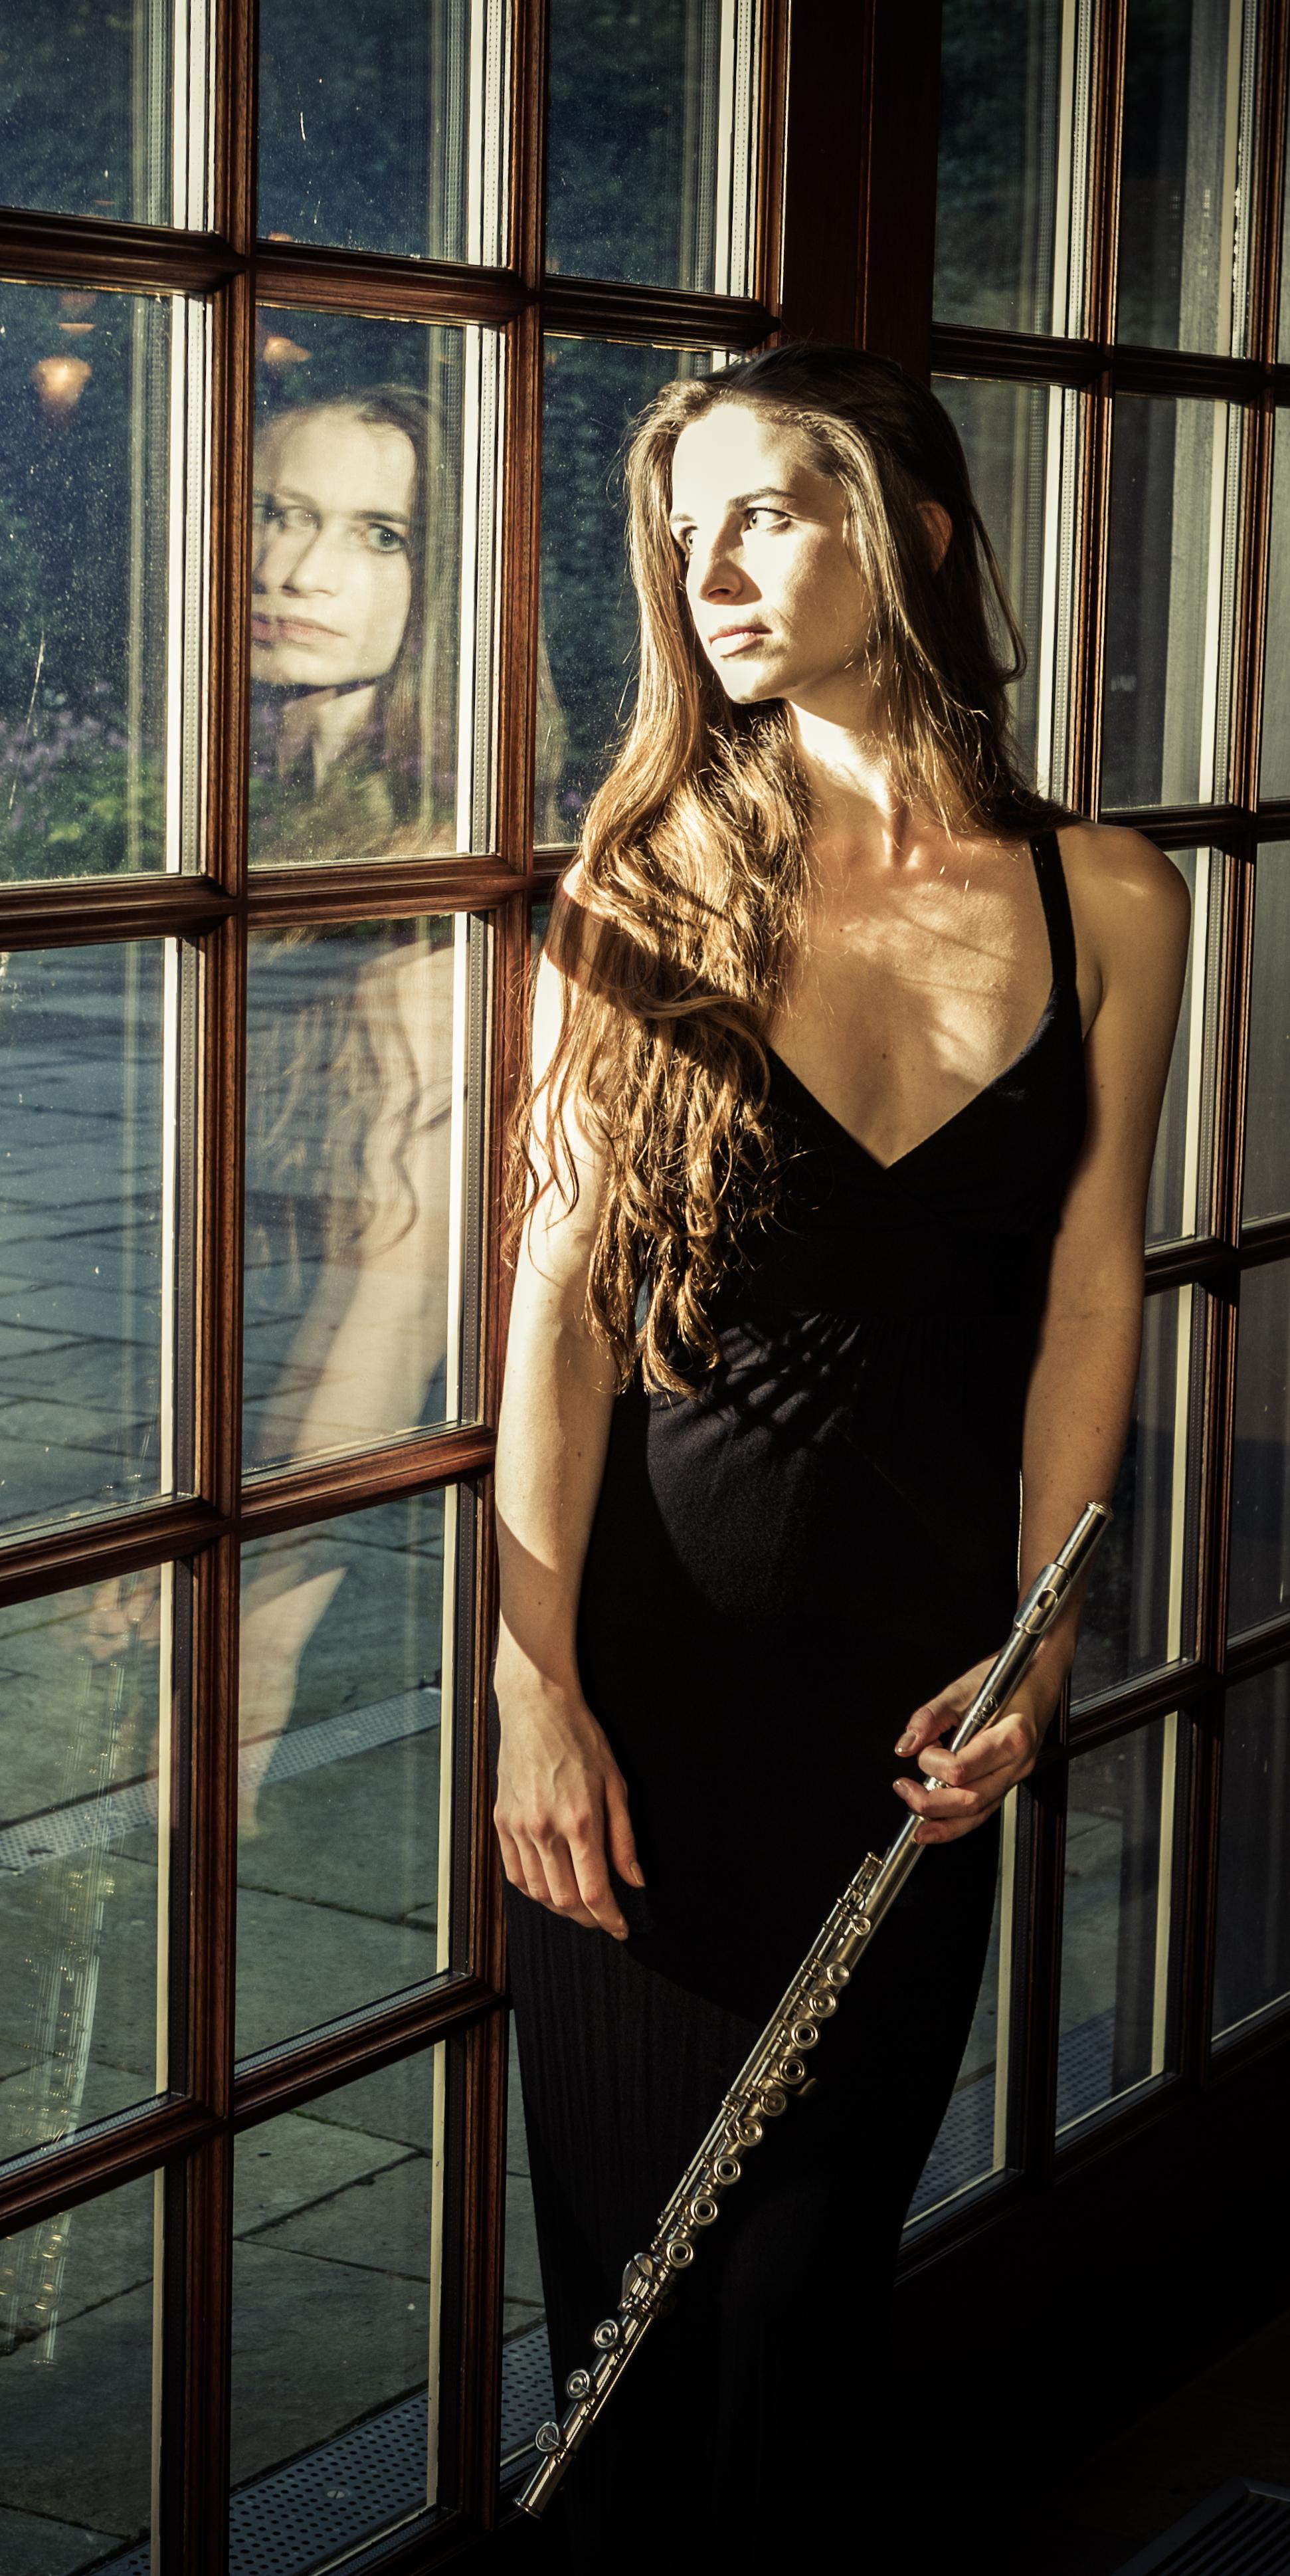 AK, Emi window with flute 3 cropped.jpg